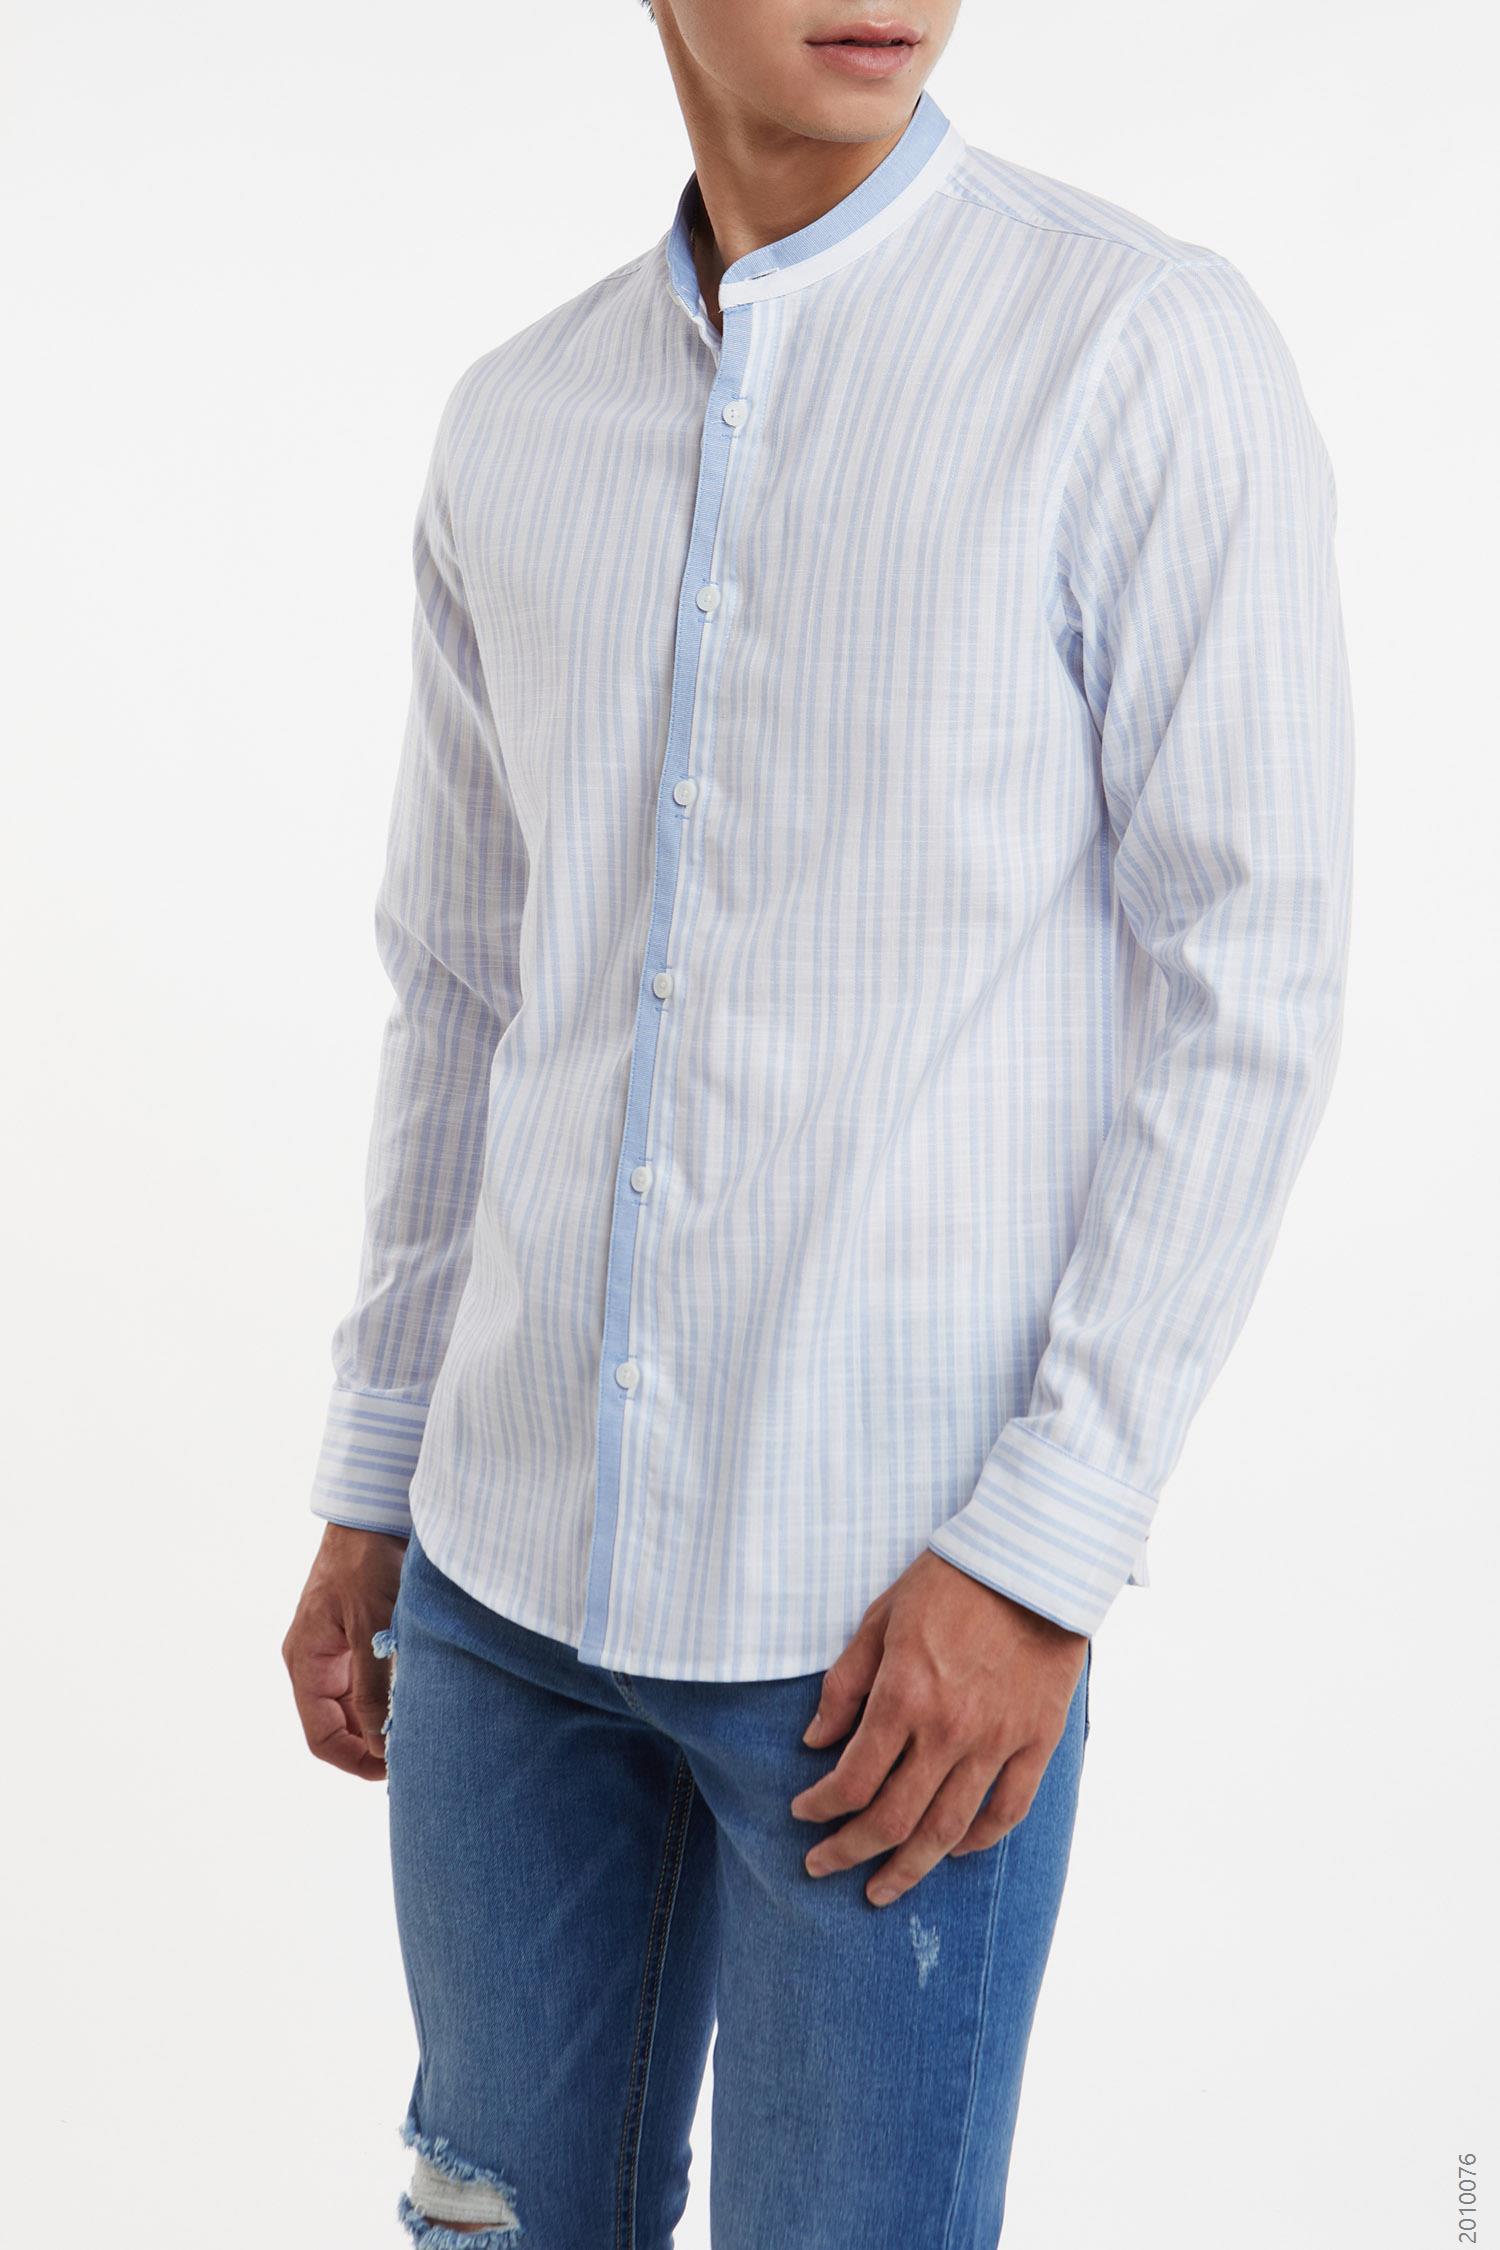 áo sơmi nam tay dài - 2010076